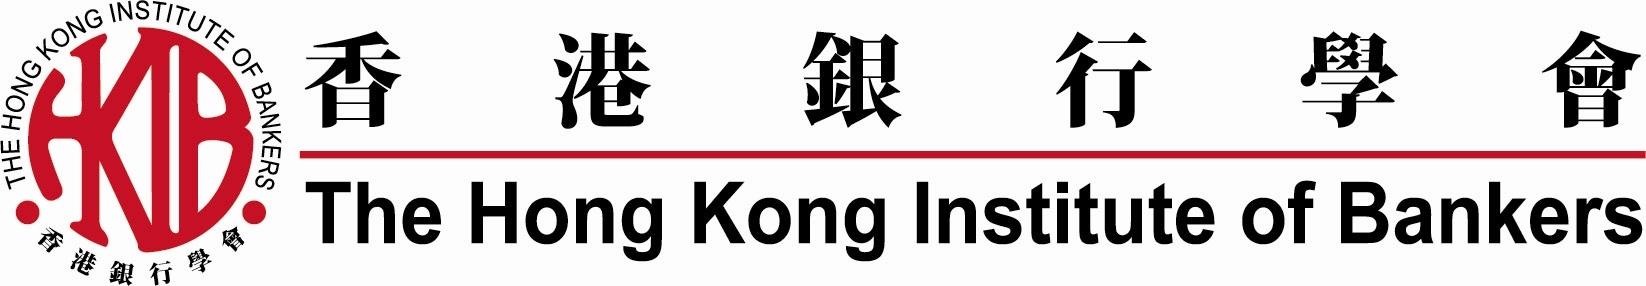 HKIB Logo (full)